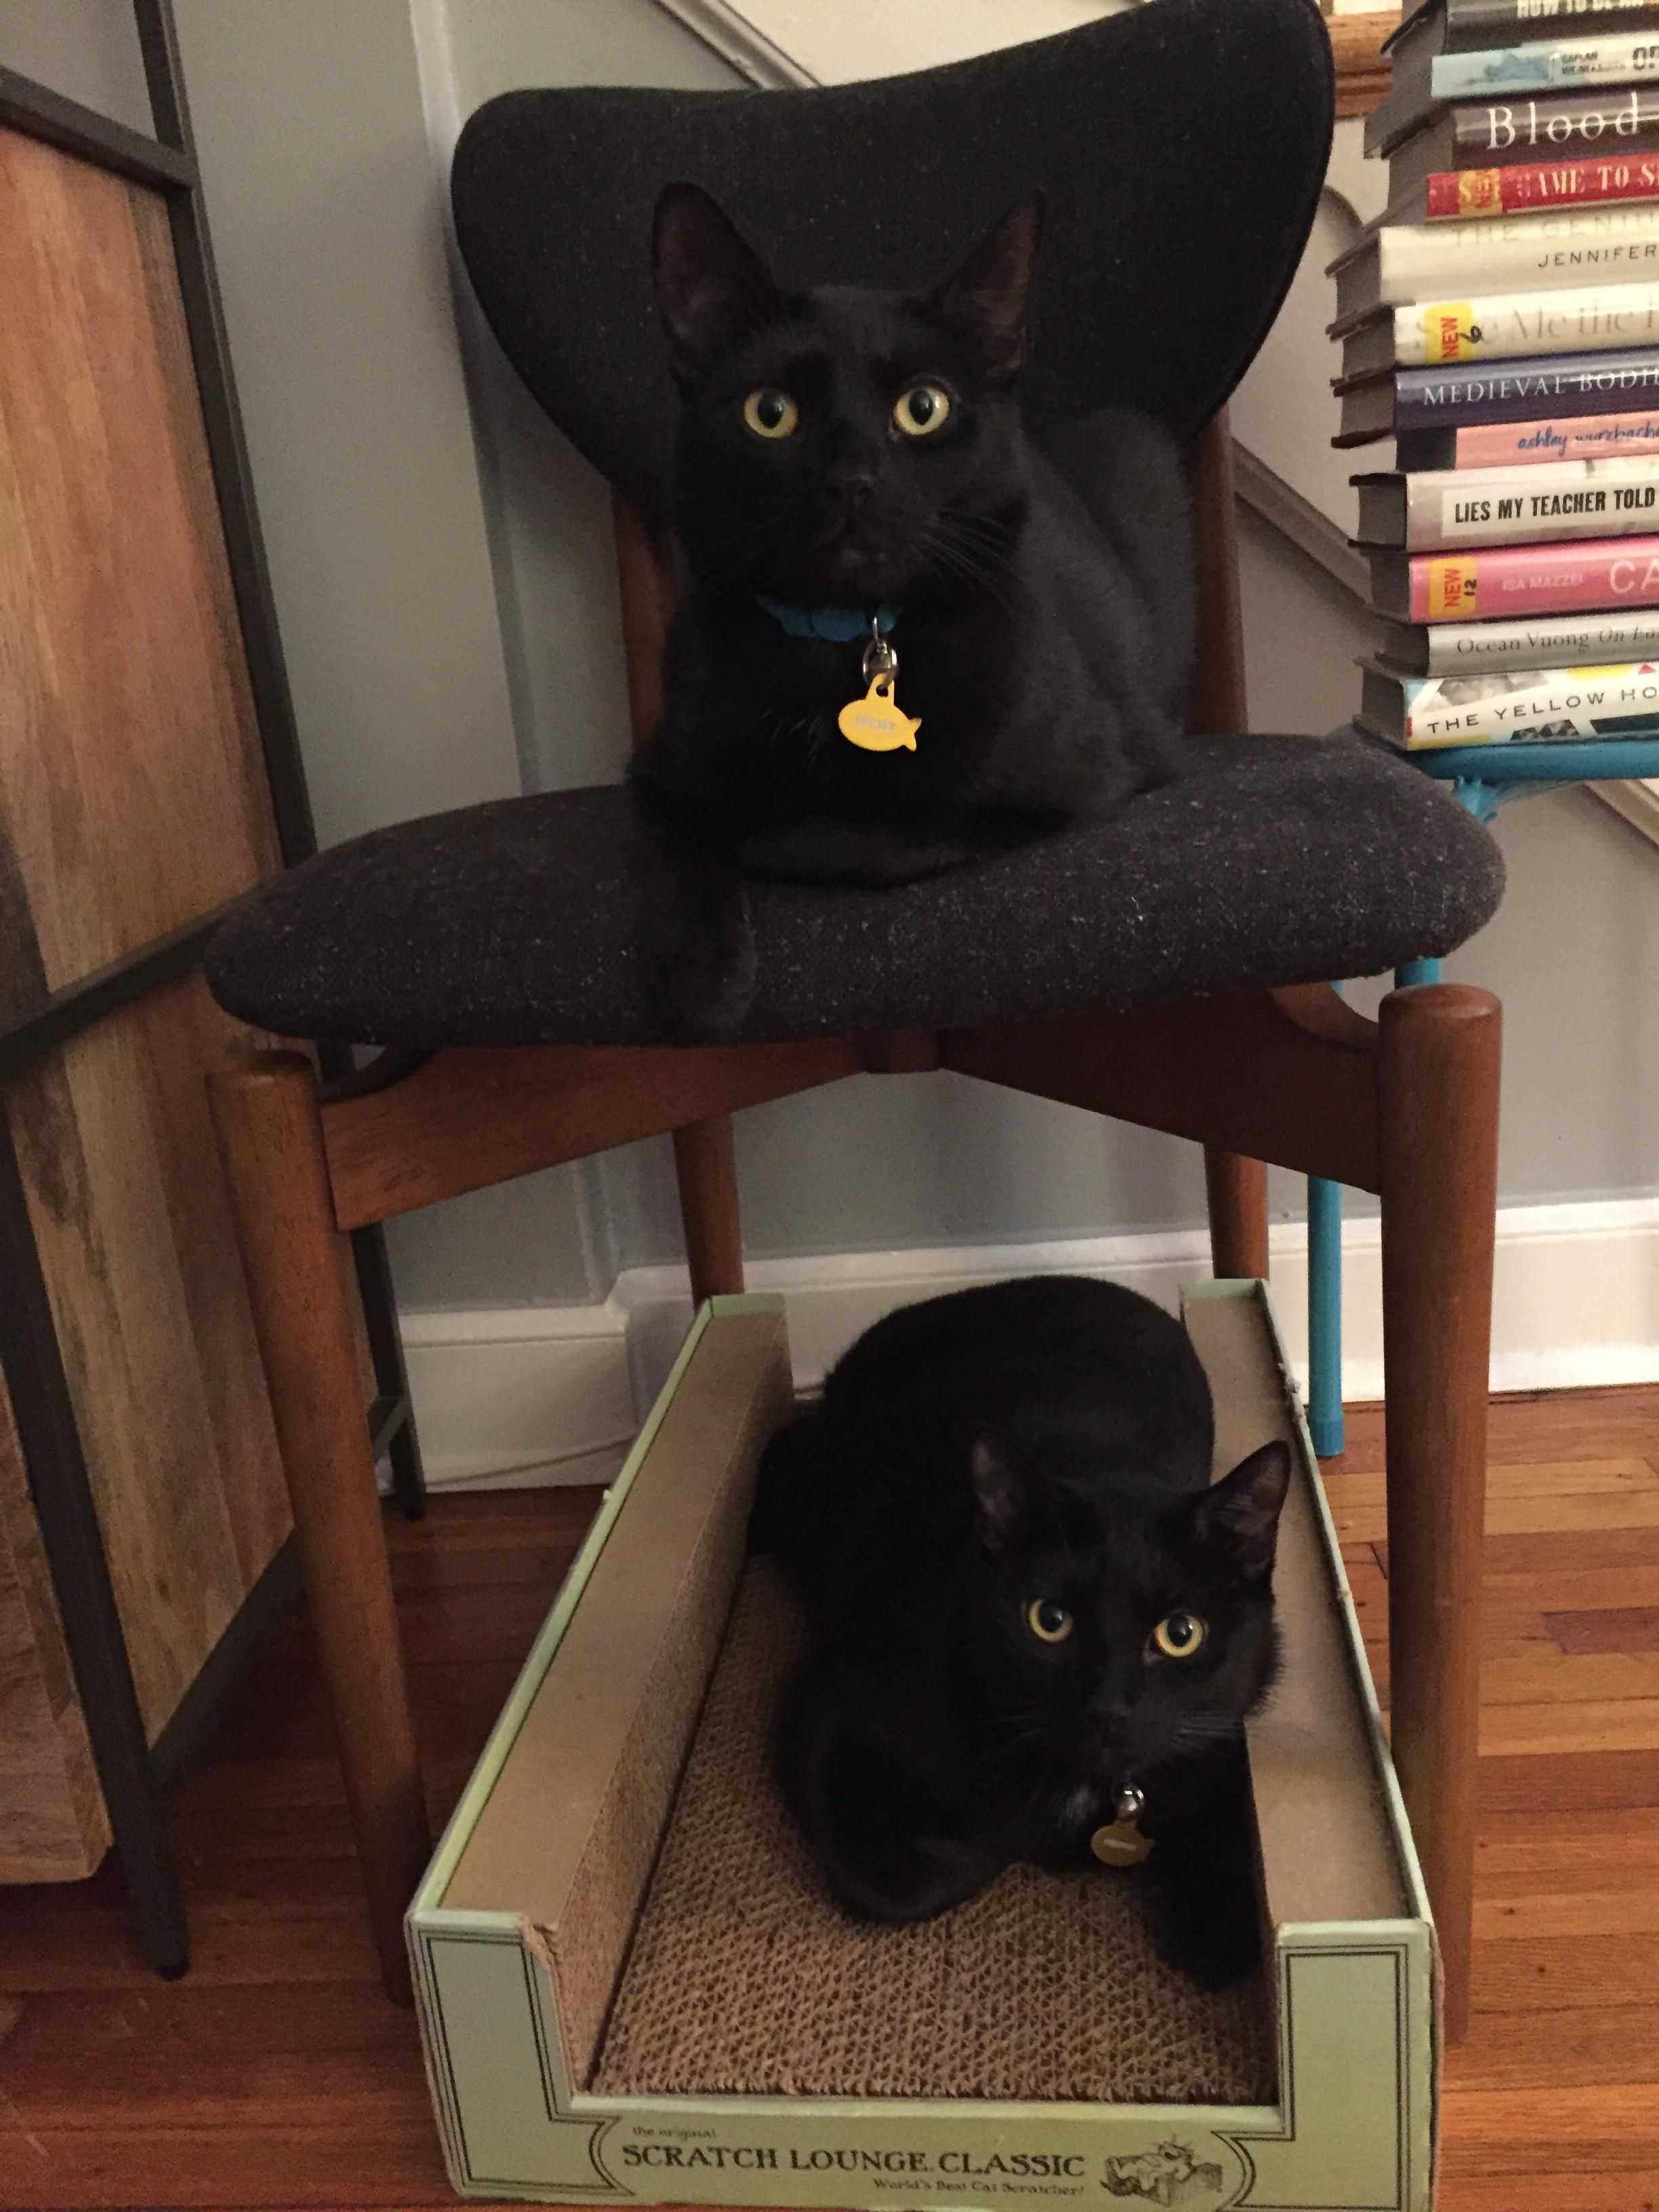 Double decker cat loaves Cats, Crazy cats, Cute little